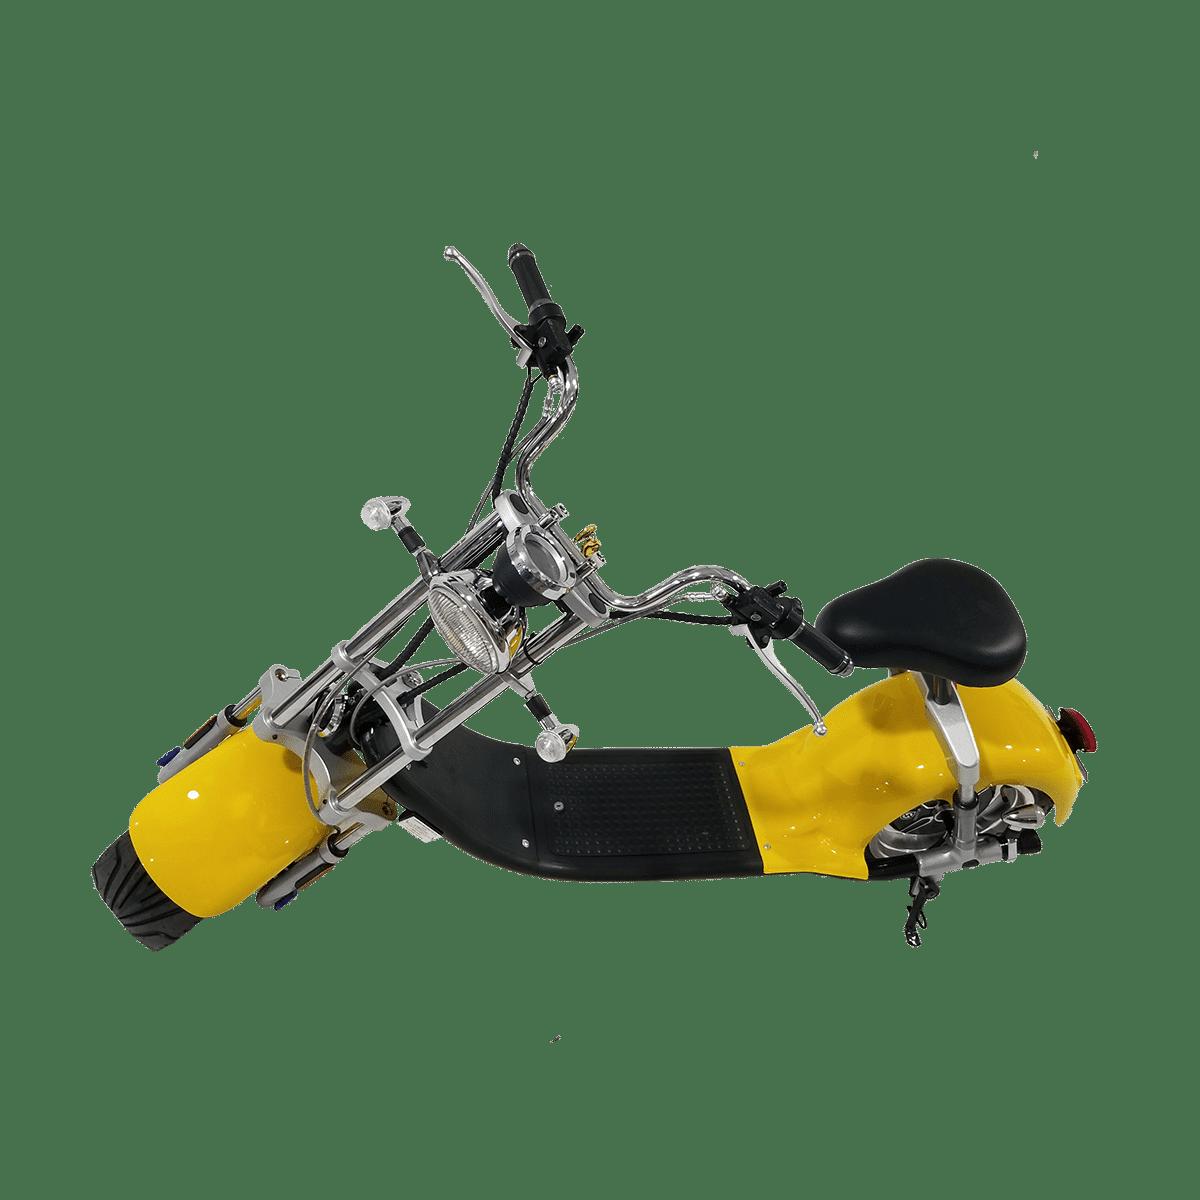 Citycoco Harley Deluxe Jaune avec 1 batterie offerte en plus 8